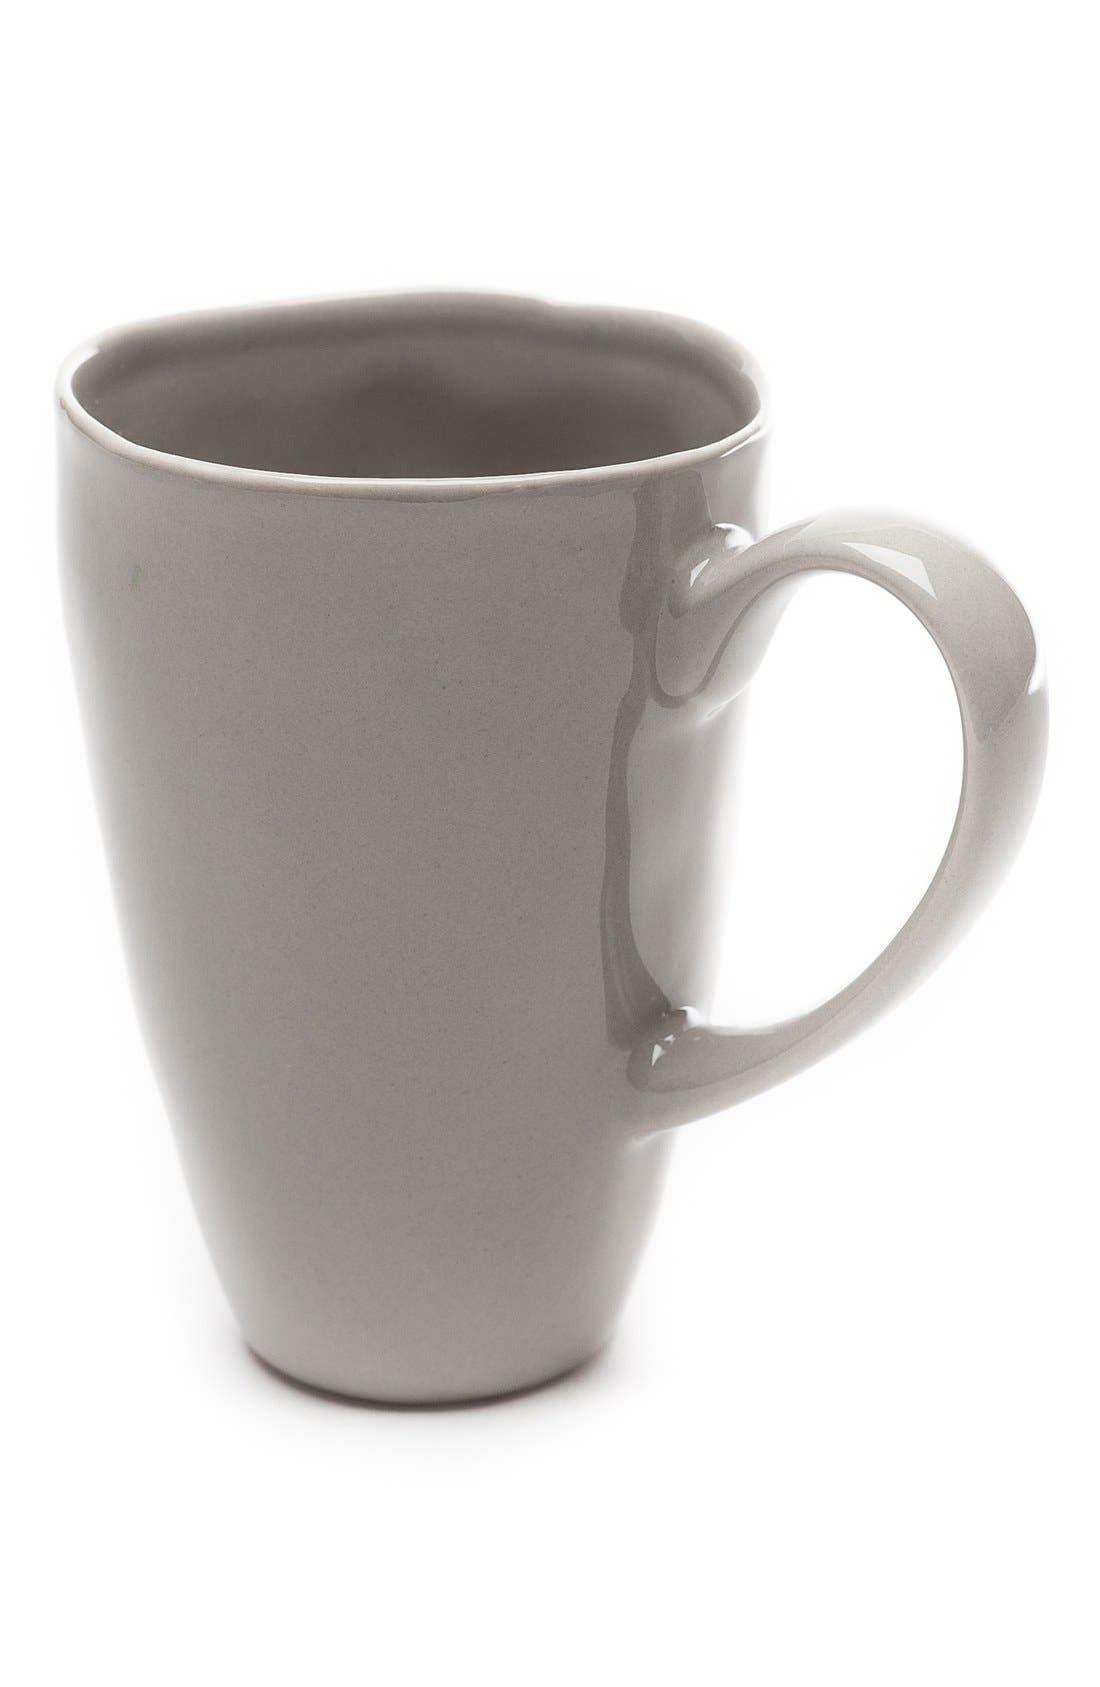 Sculptured Porcelain Coffee Mugs,                             Main thumbnail 1, color,                             Grey